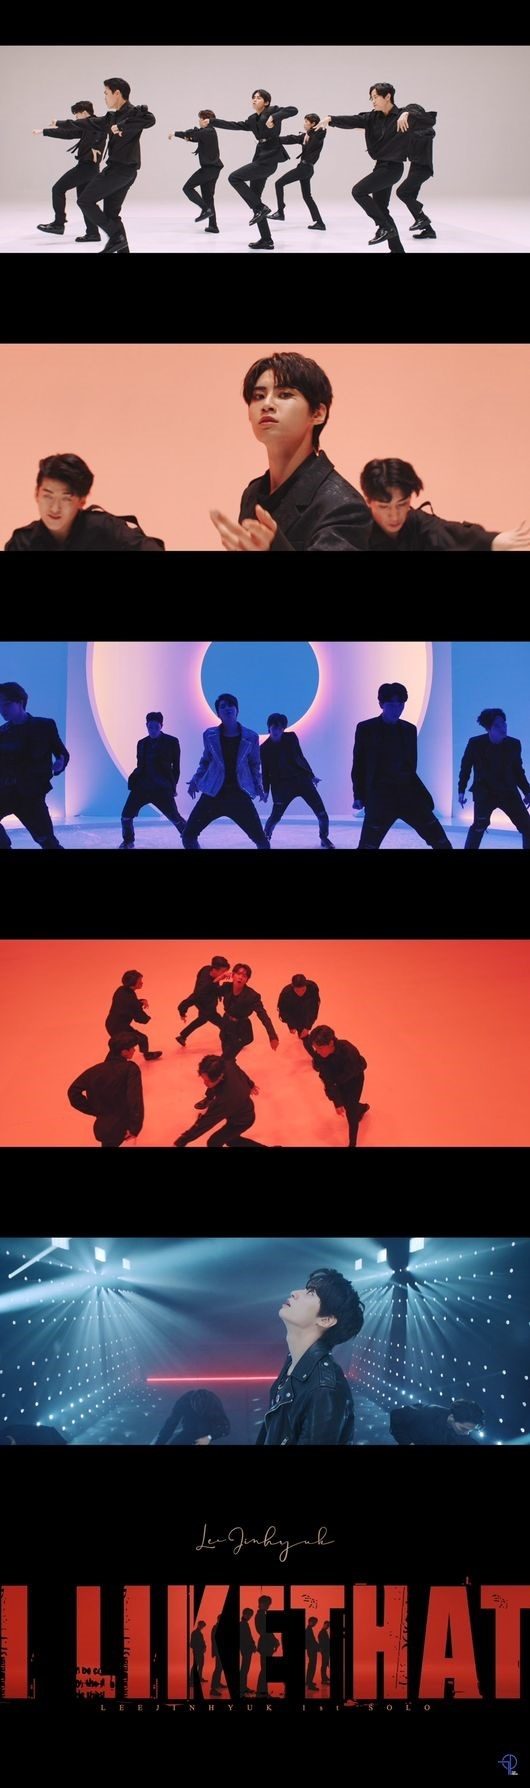 UP10TION李镇赫公开主打歌《I Like That》演出版本MV